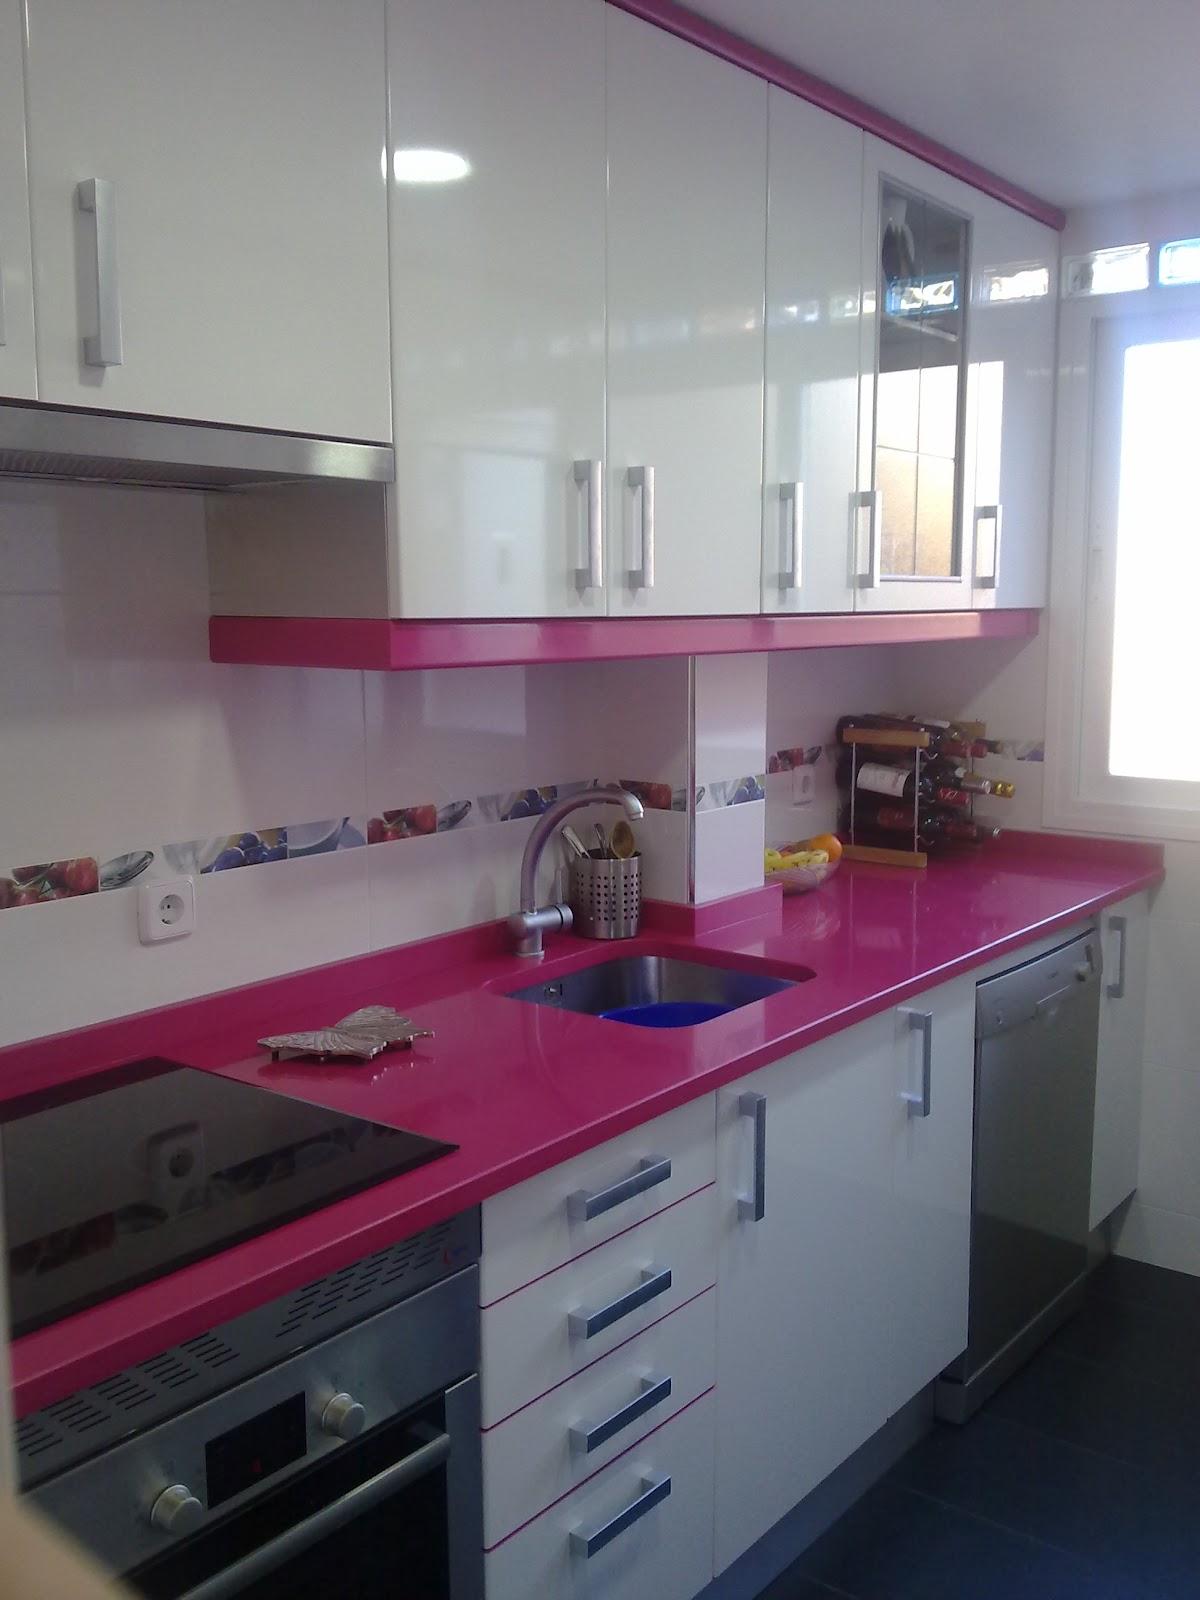 Laminado alto brillo blanco remates fucsia - Cocinas rosa fucsia ...